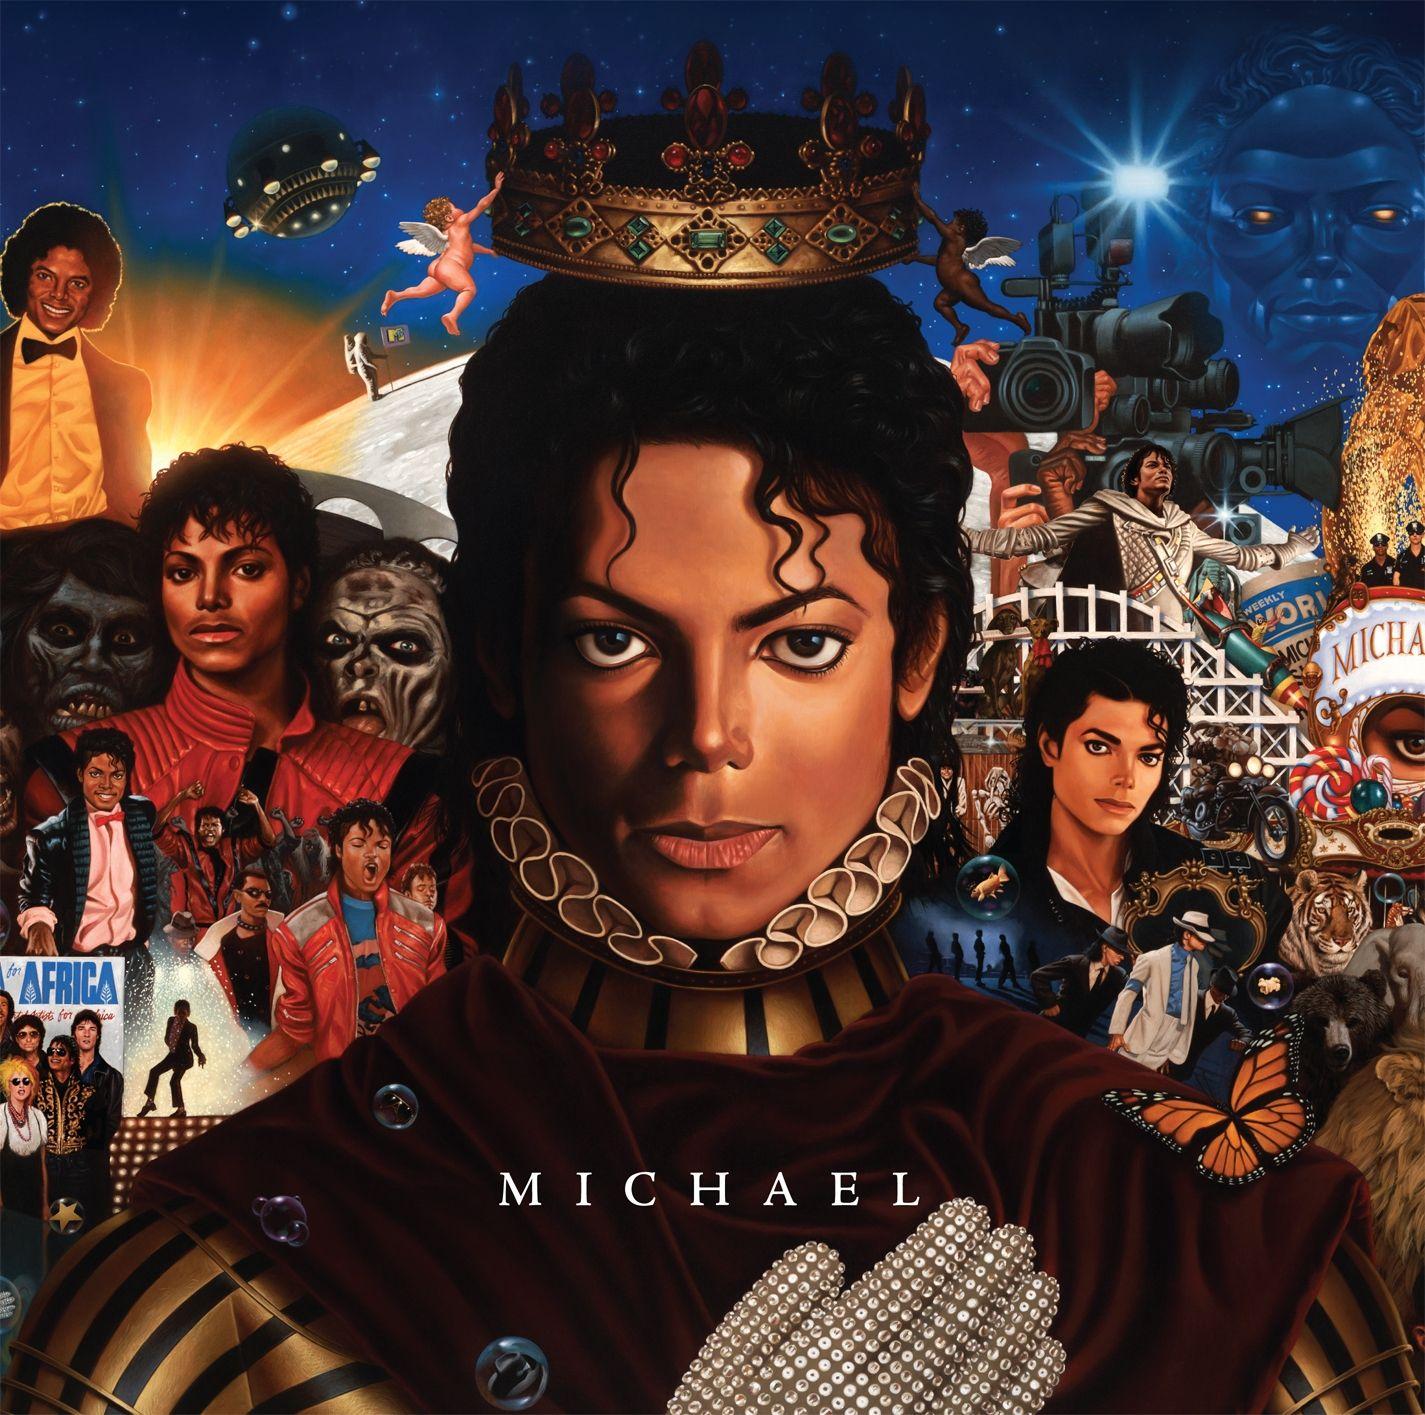 http://4.bp.blogspot.com/-V8K9tw_B_n8/T052nyW3zsI/AAAAAAAAAYE/FlfbtHqH8tQ/s1600/Michael-Jackson-album-postumo.jpg